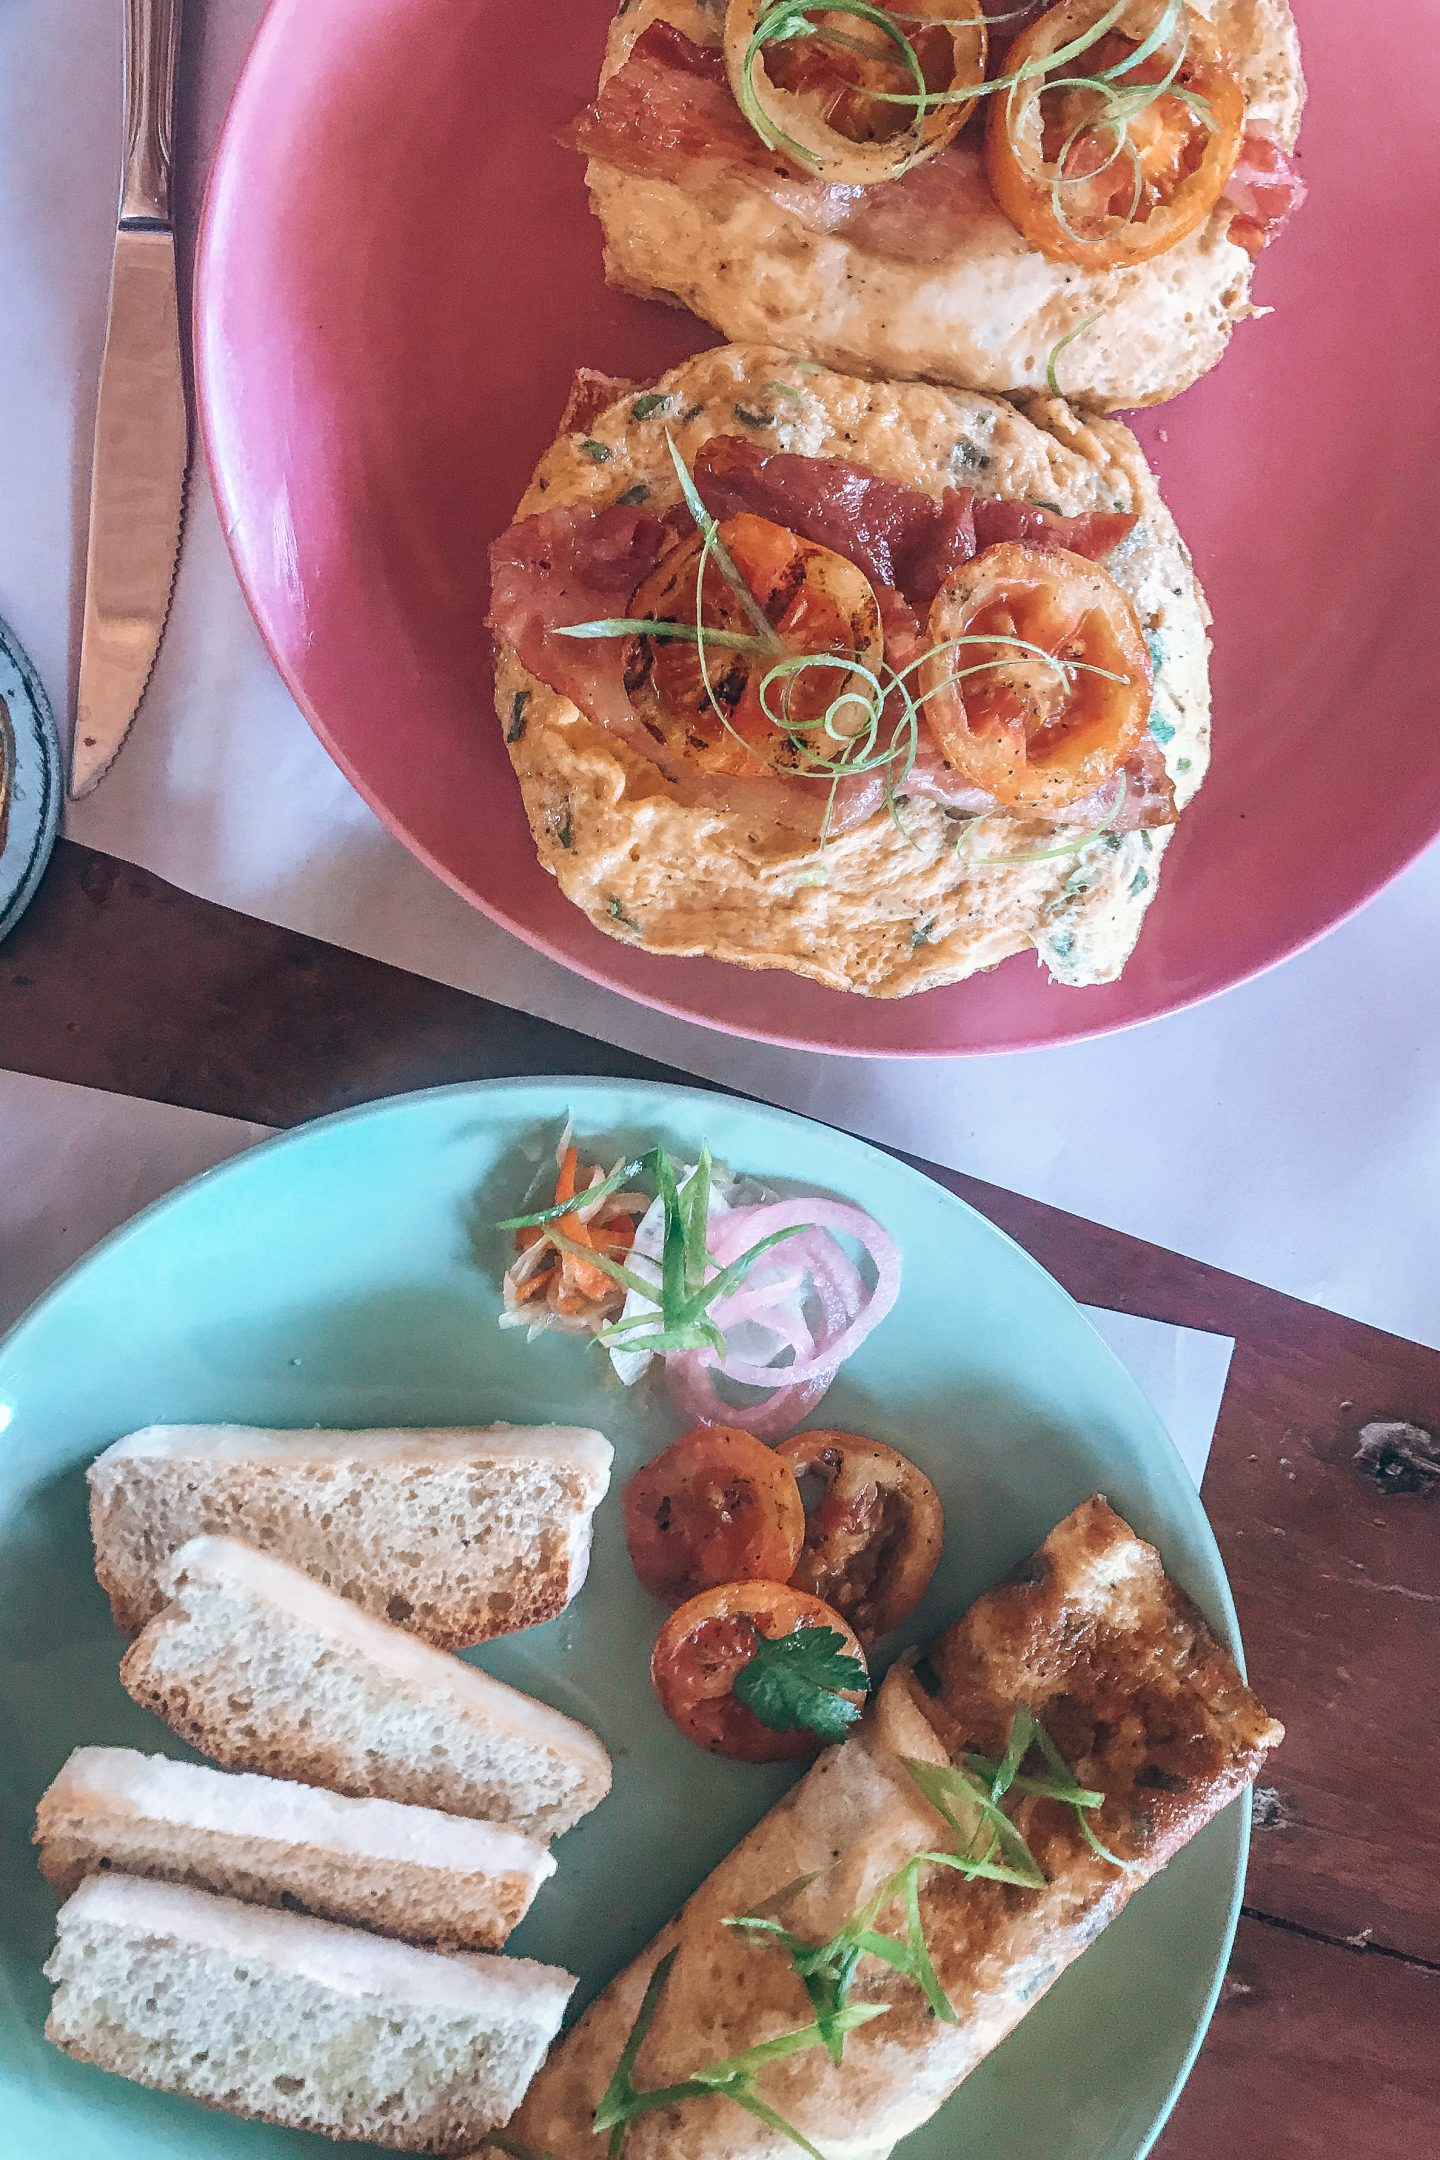 veggie food siargao: Omlettes and toast